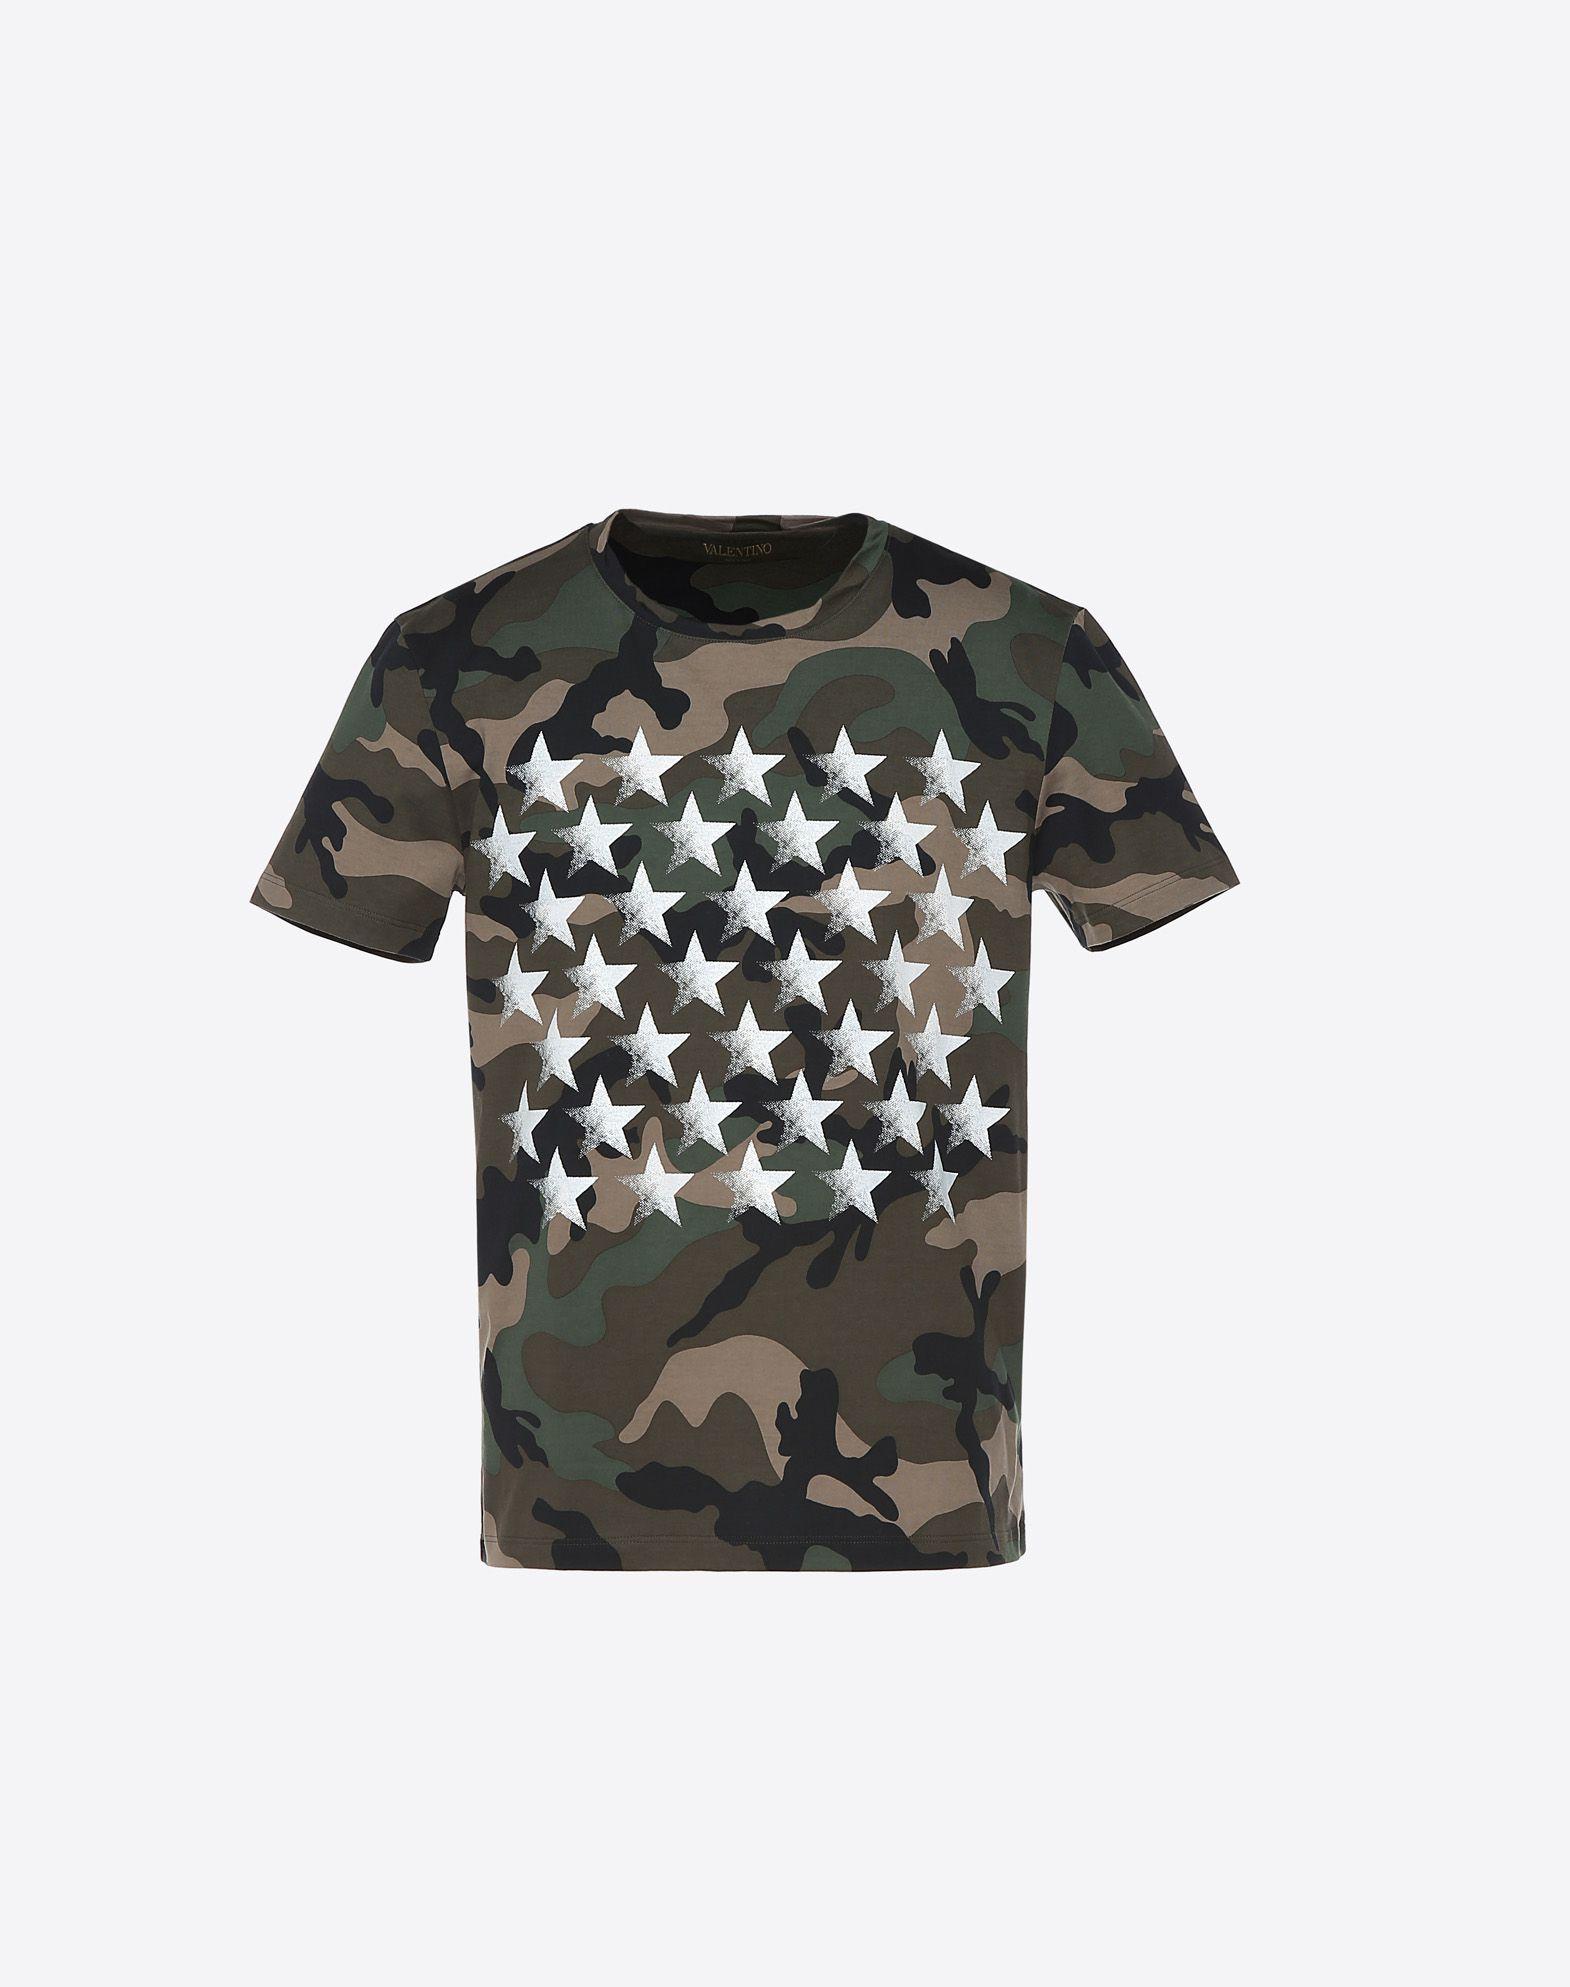 VALENTINO Print Jersey Camouflage design Round collar Short sleeves  37958160ud